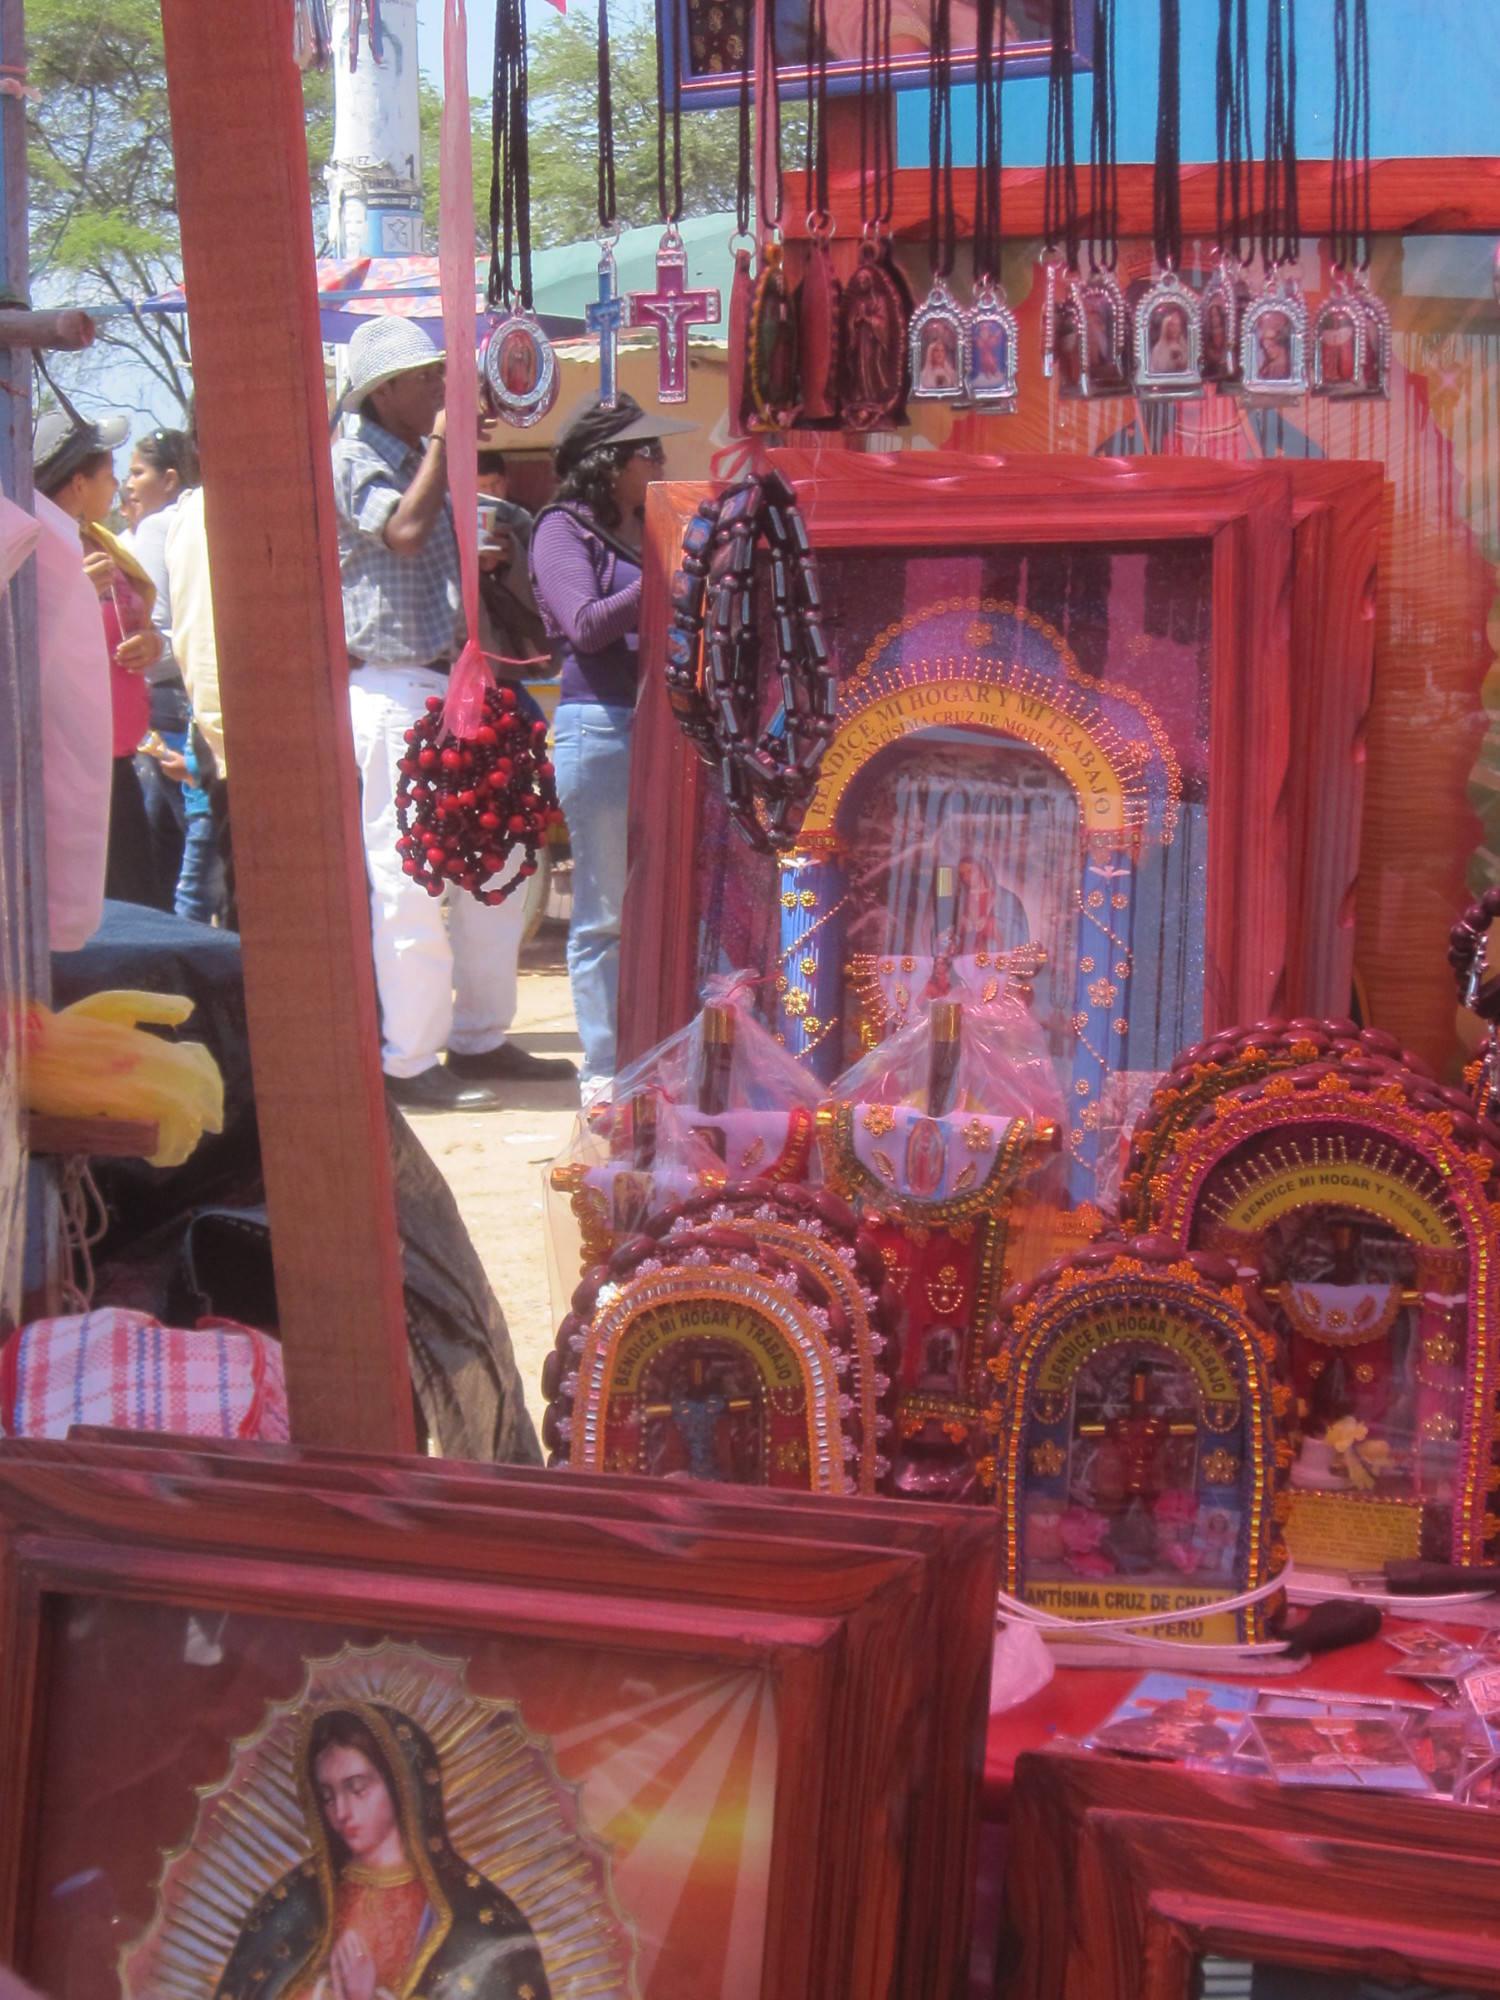 Pilgrim souvenirs sold at the festival